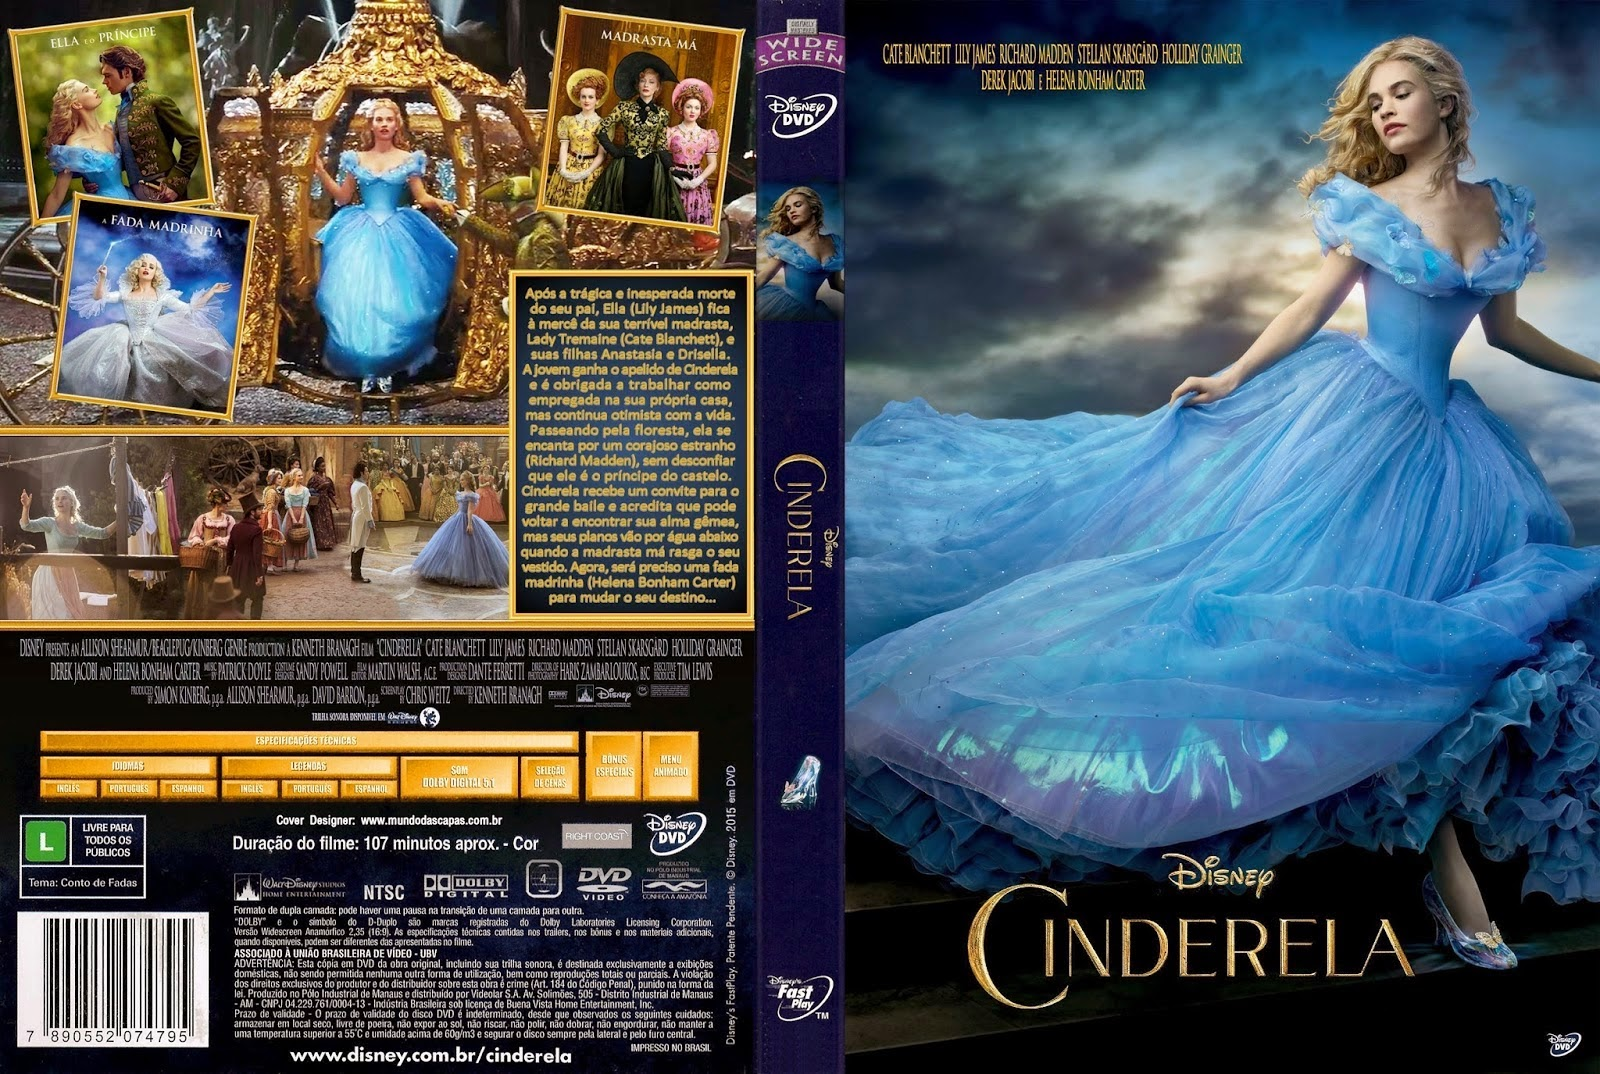 Tuga Downloads 2 Cinderela Cinderella Torrent Bluray 720p 1080p Legenda Oficial 2015